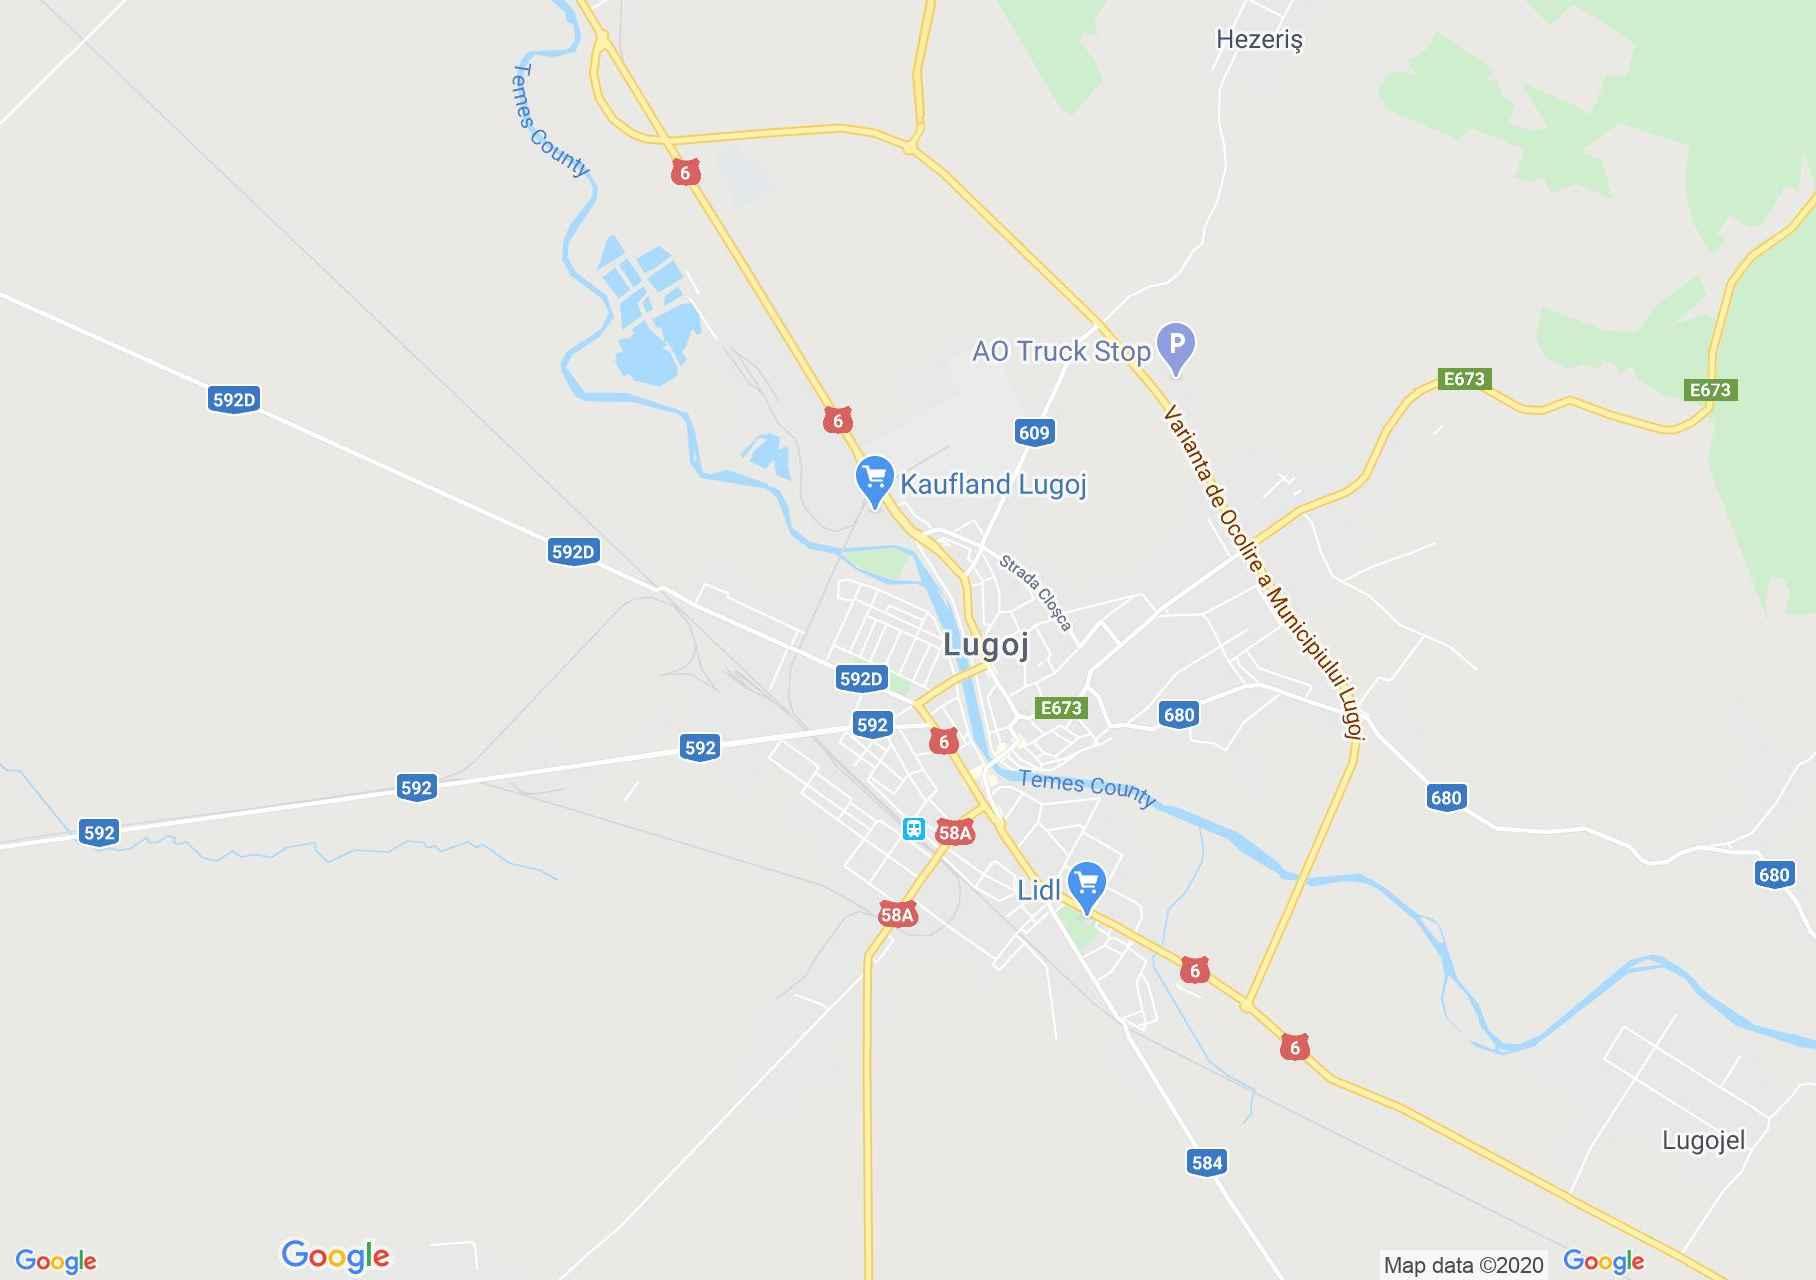 Lugoj, Interactive tourist map